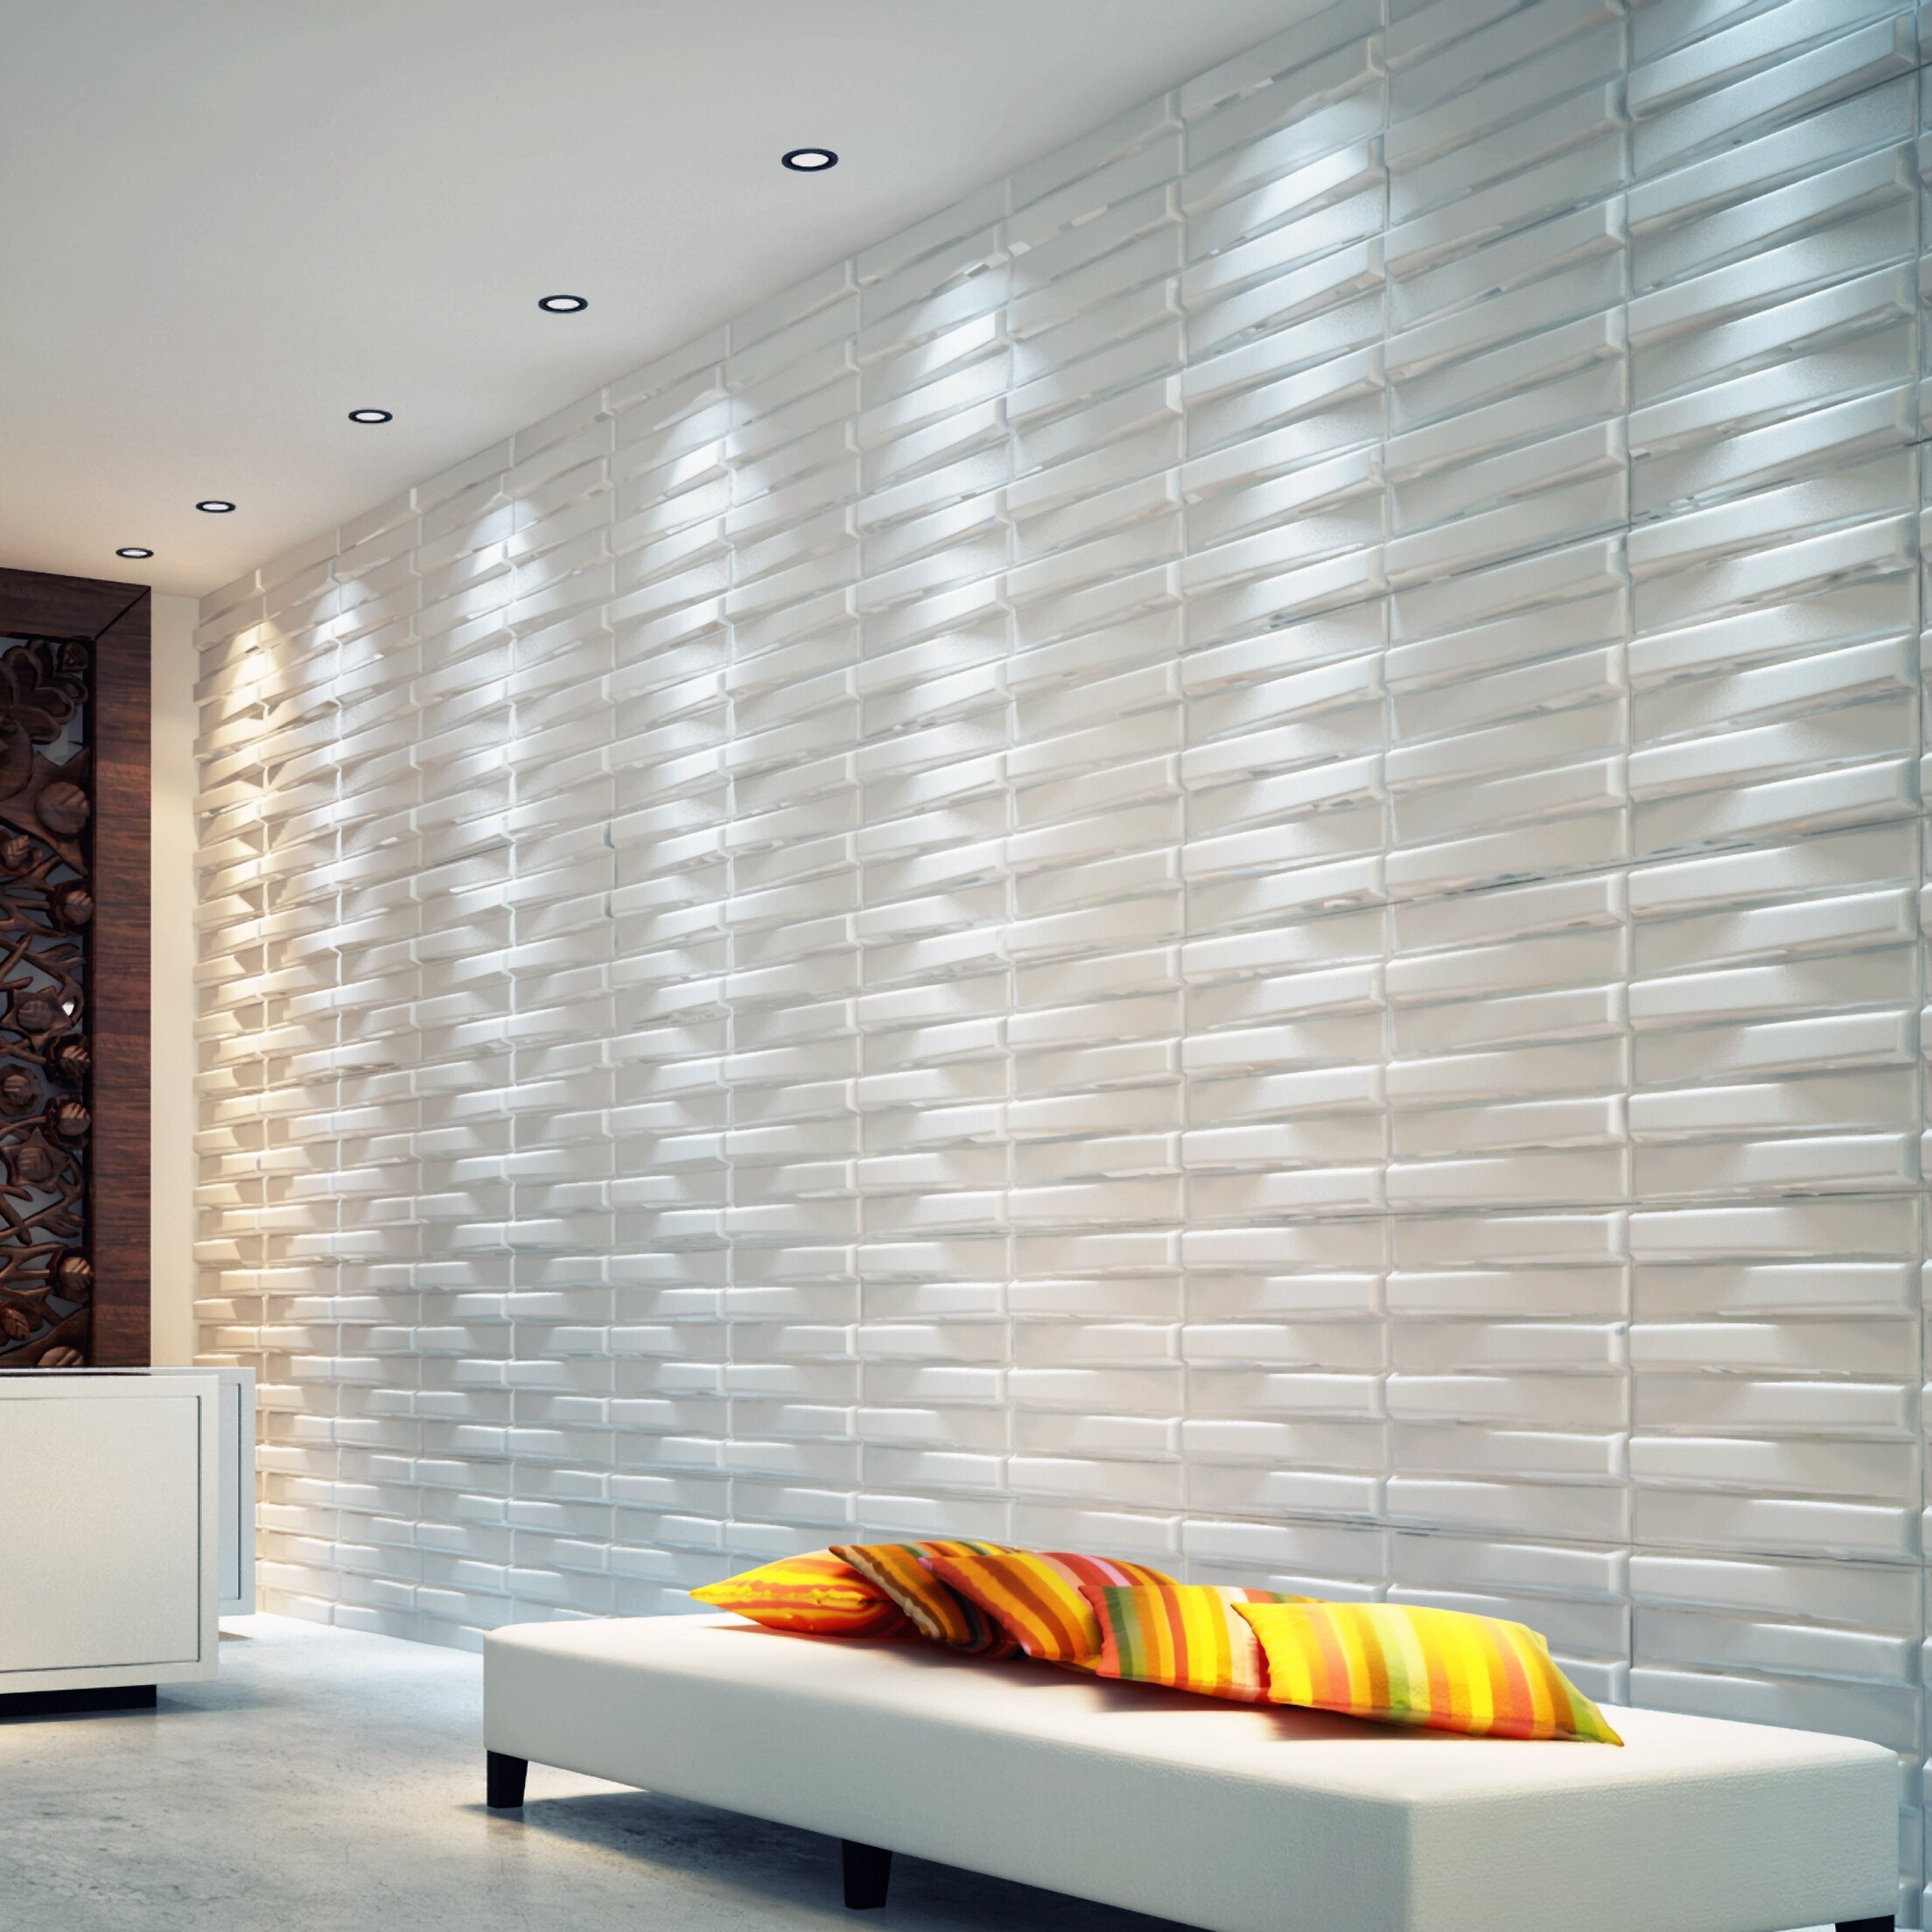 Orren Ellis Methuen 19 7 X 19 7 Wall Paneling Wayfair